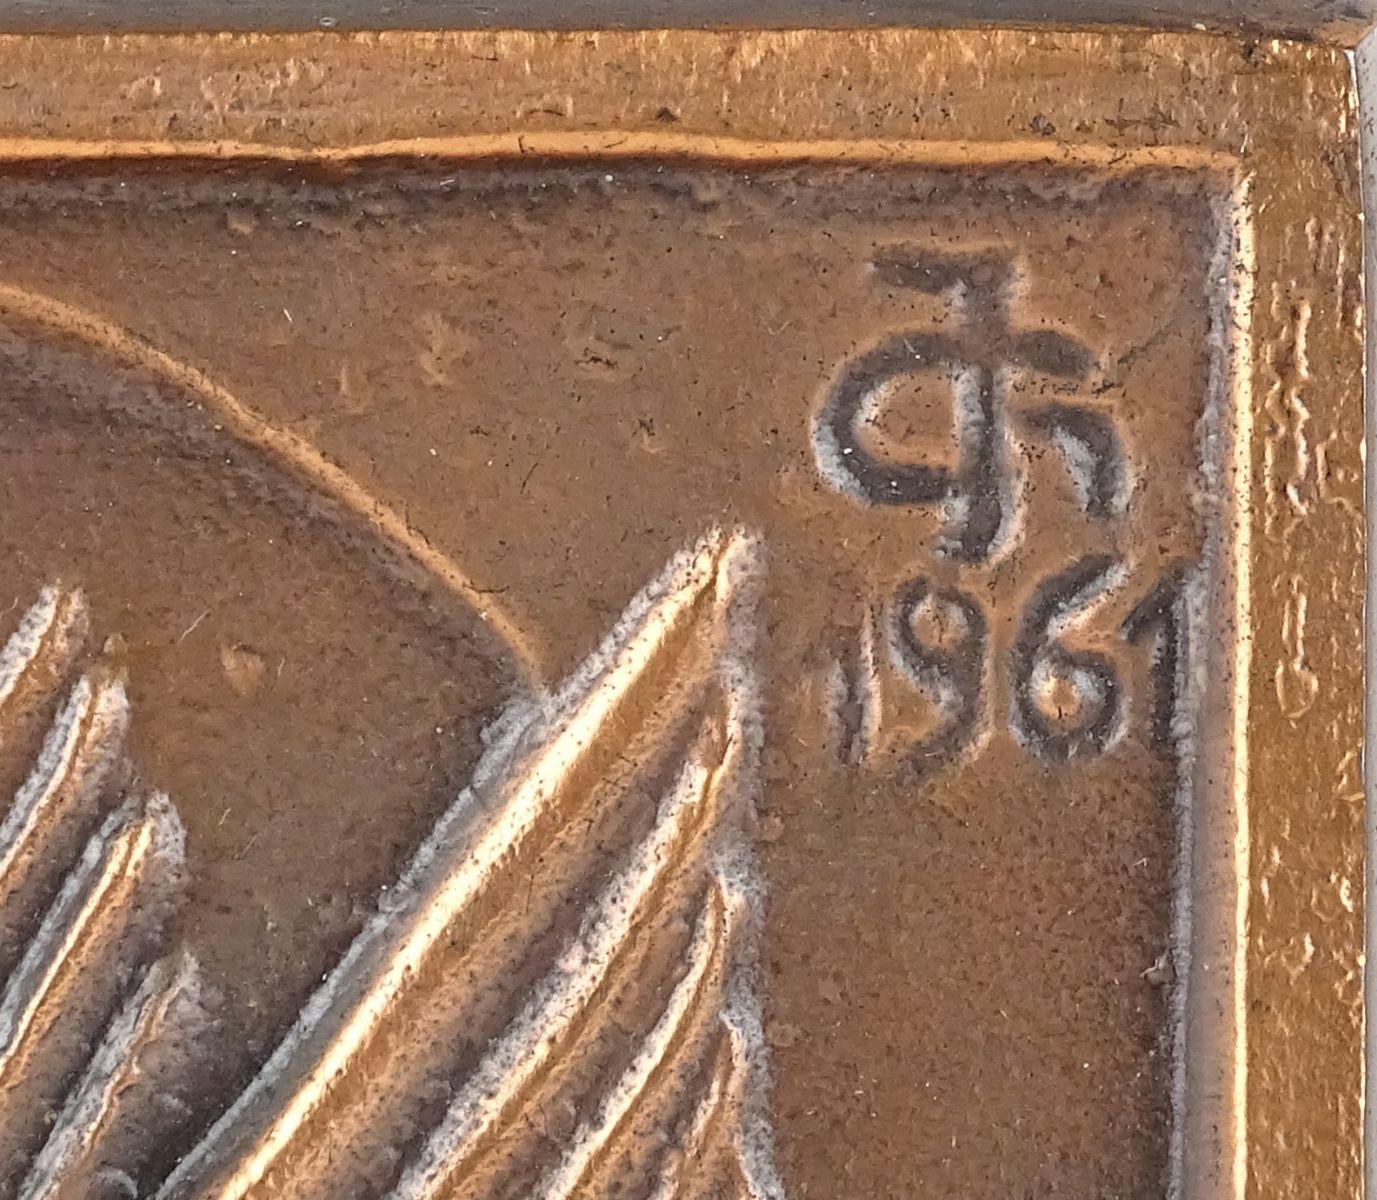 DSC09155.JPG (1377×1200)